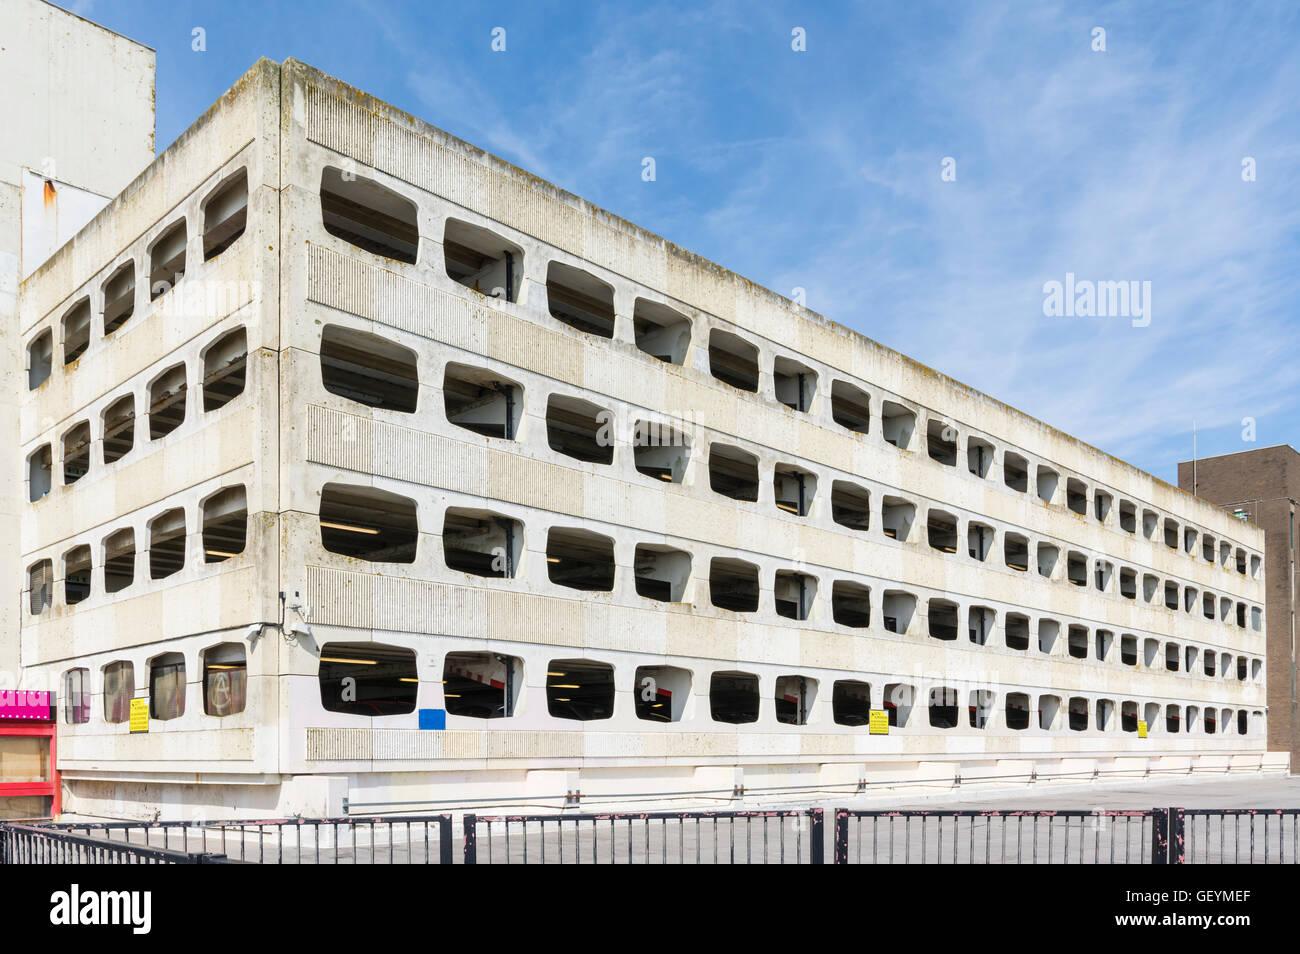 Grafton multi-storey car park in Worthing. Ugly concrete multi-storey car park in Worthing, West Sussex, England, - Stock Image